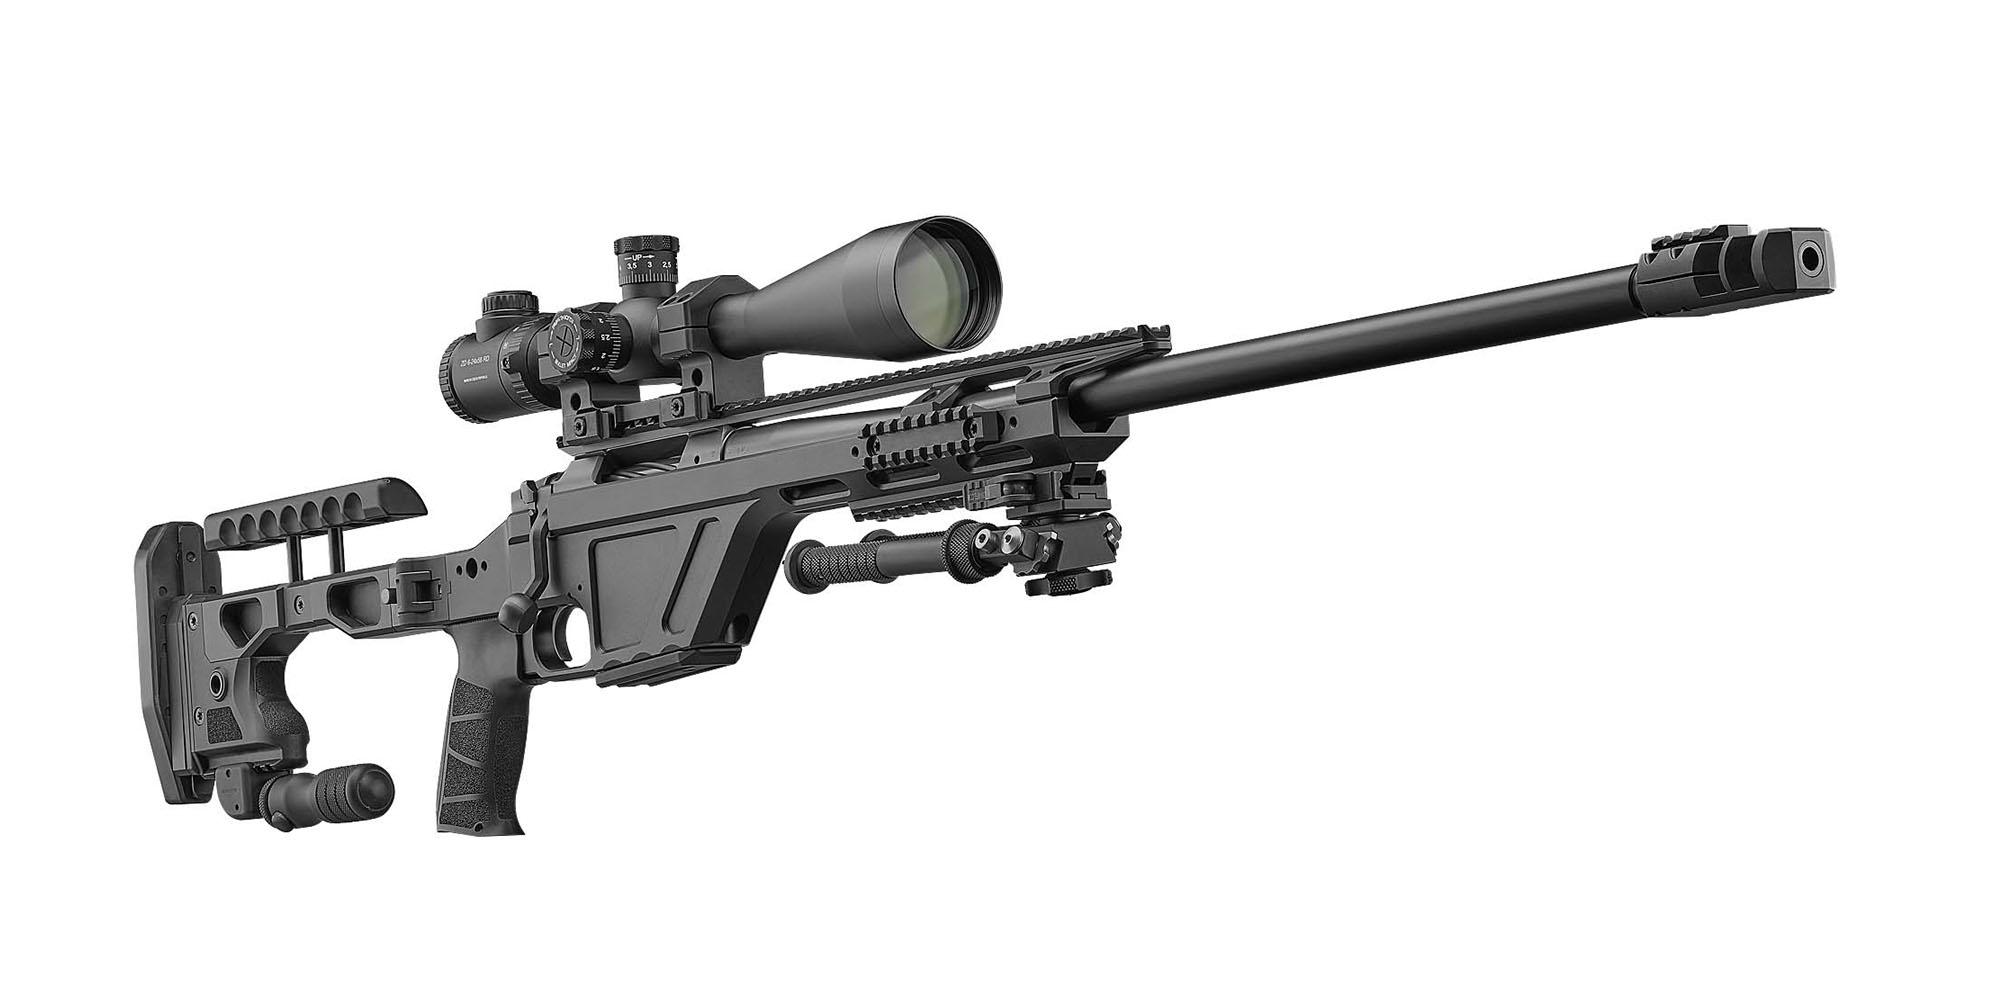 cz tsr boltaction tactical sniper rifle gunsweekcom